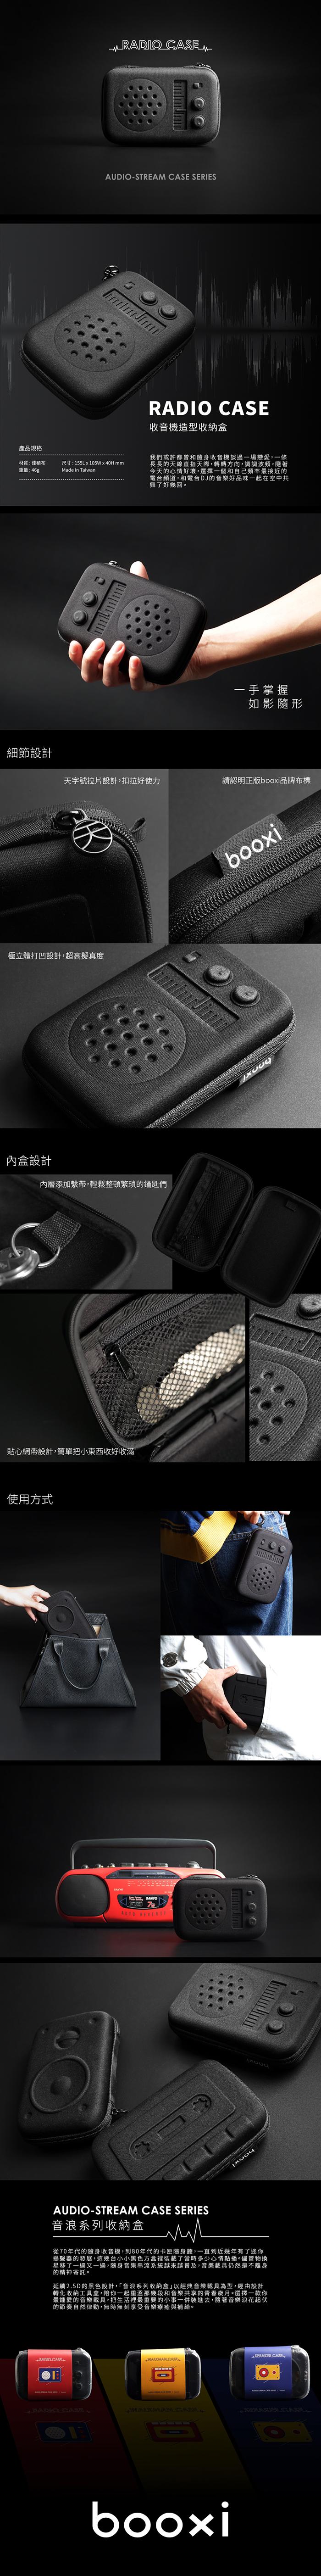 booxi | 收音機造型收納盒 Radio Case